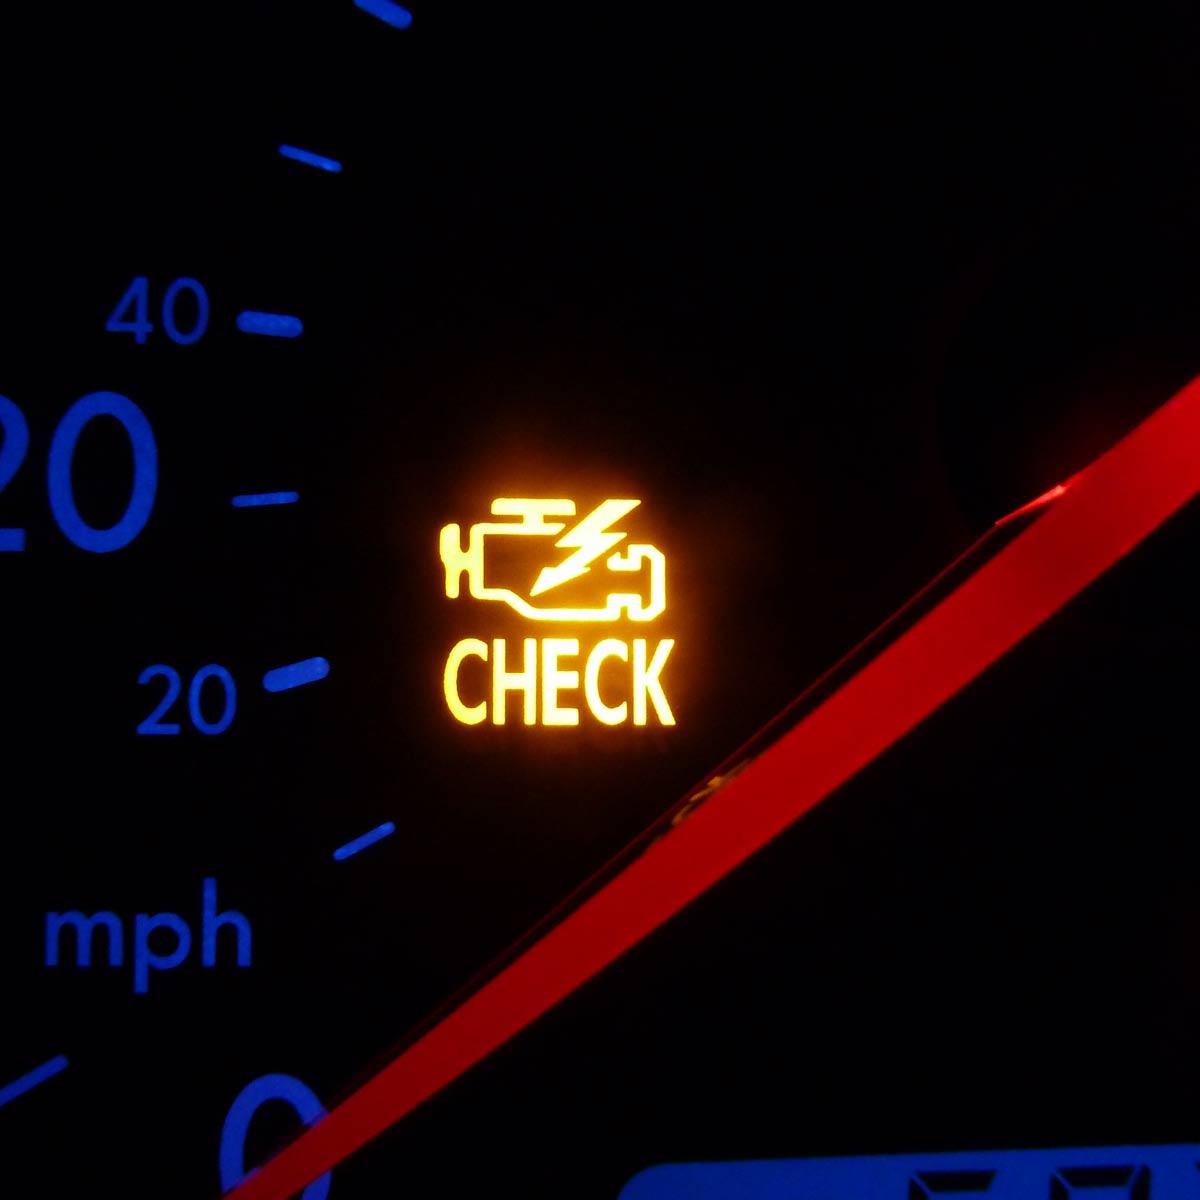 Sr20det Check Engine Light: Check Engine Light Is On Inspection